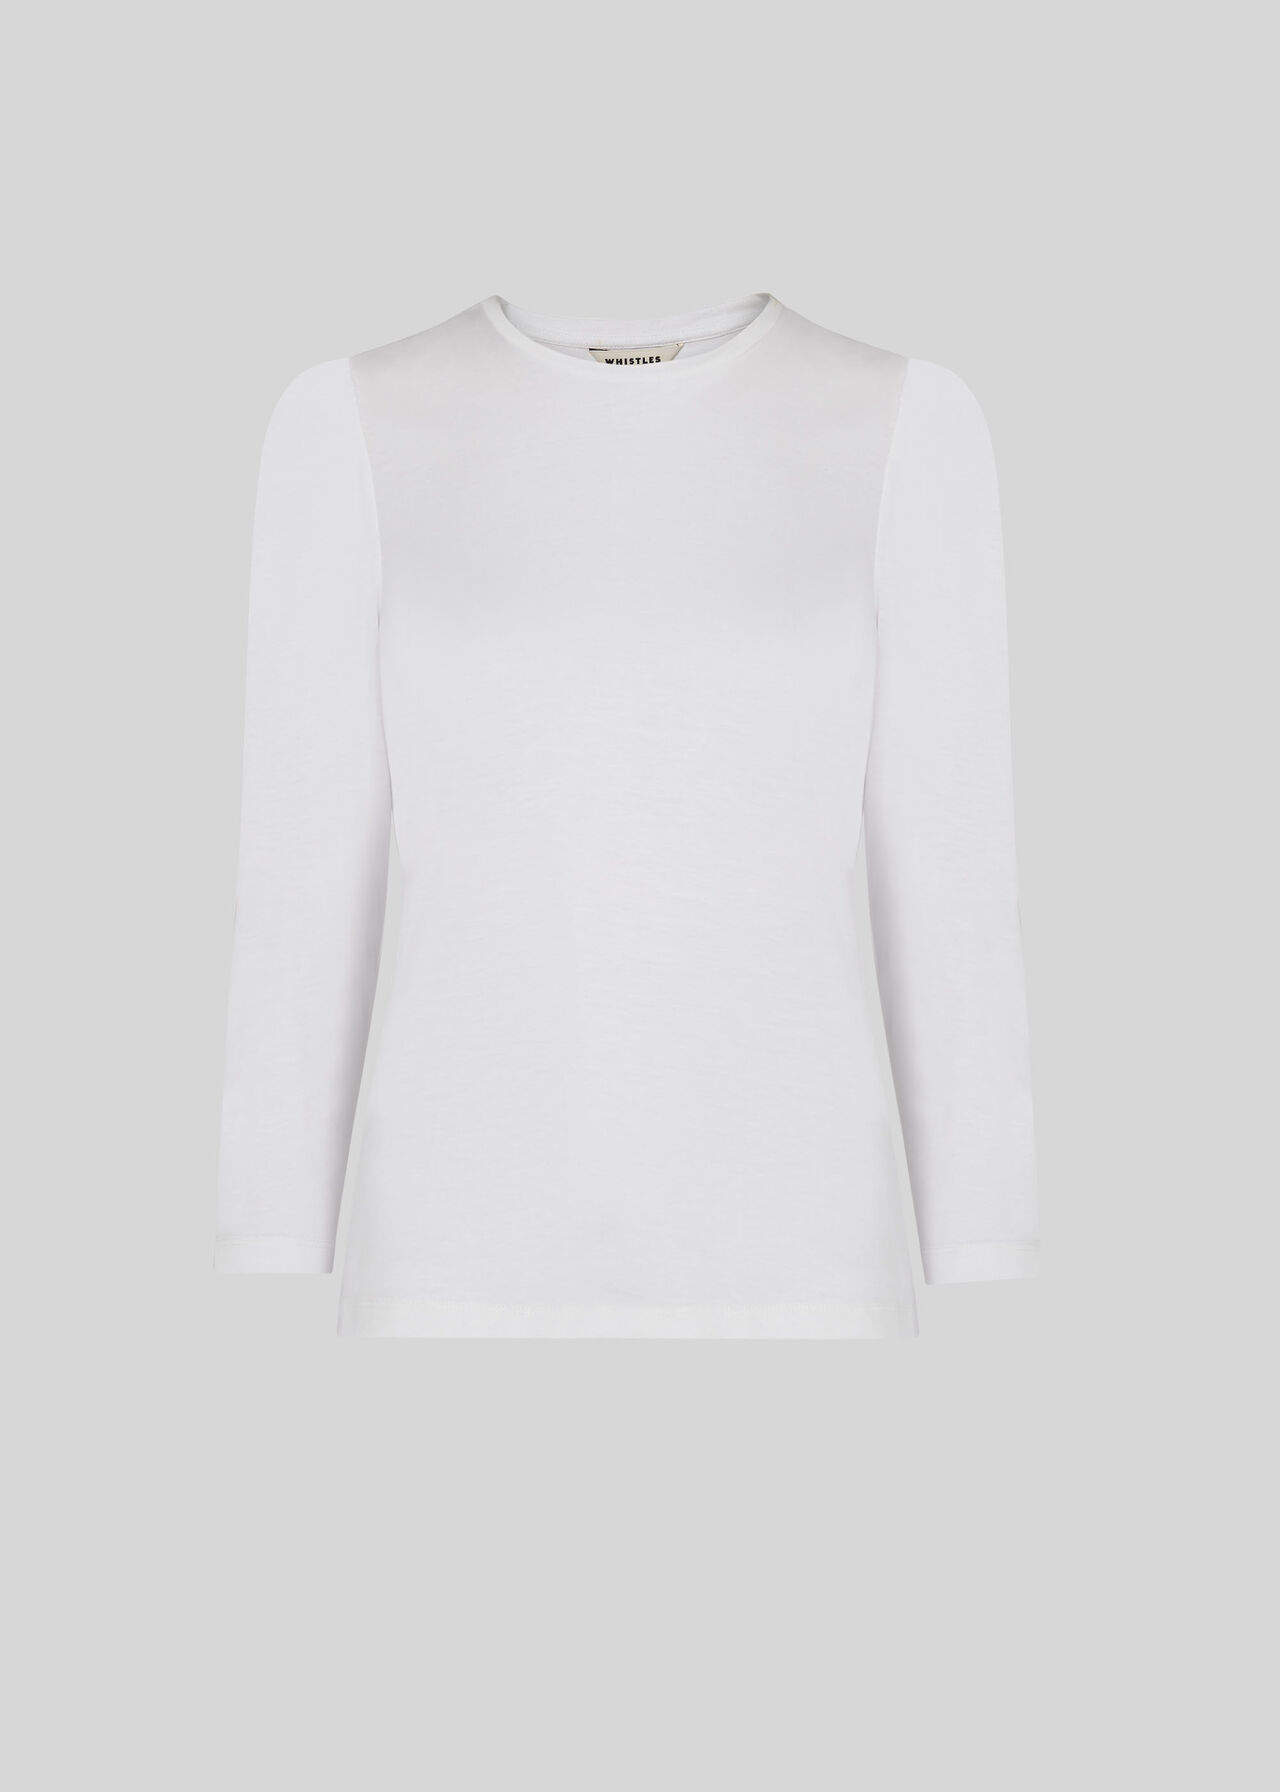 Puff Sleeve Top White